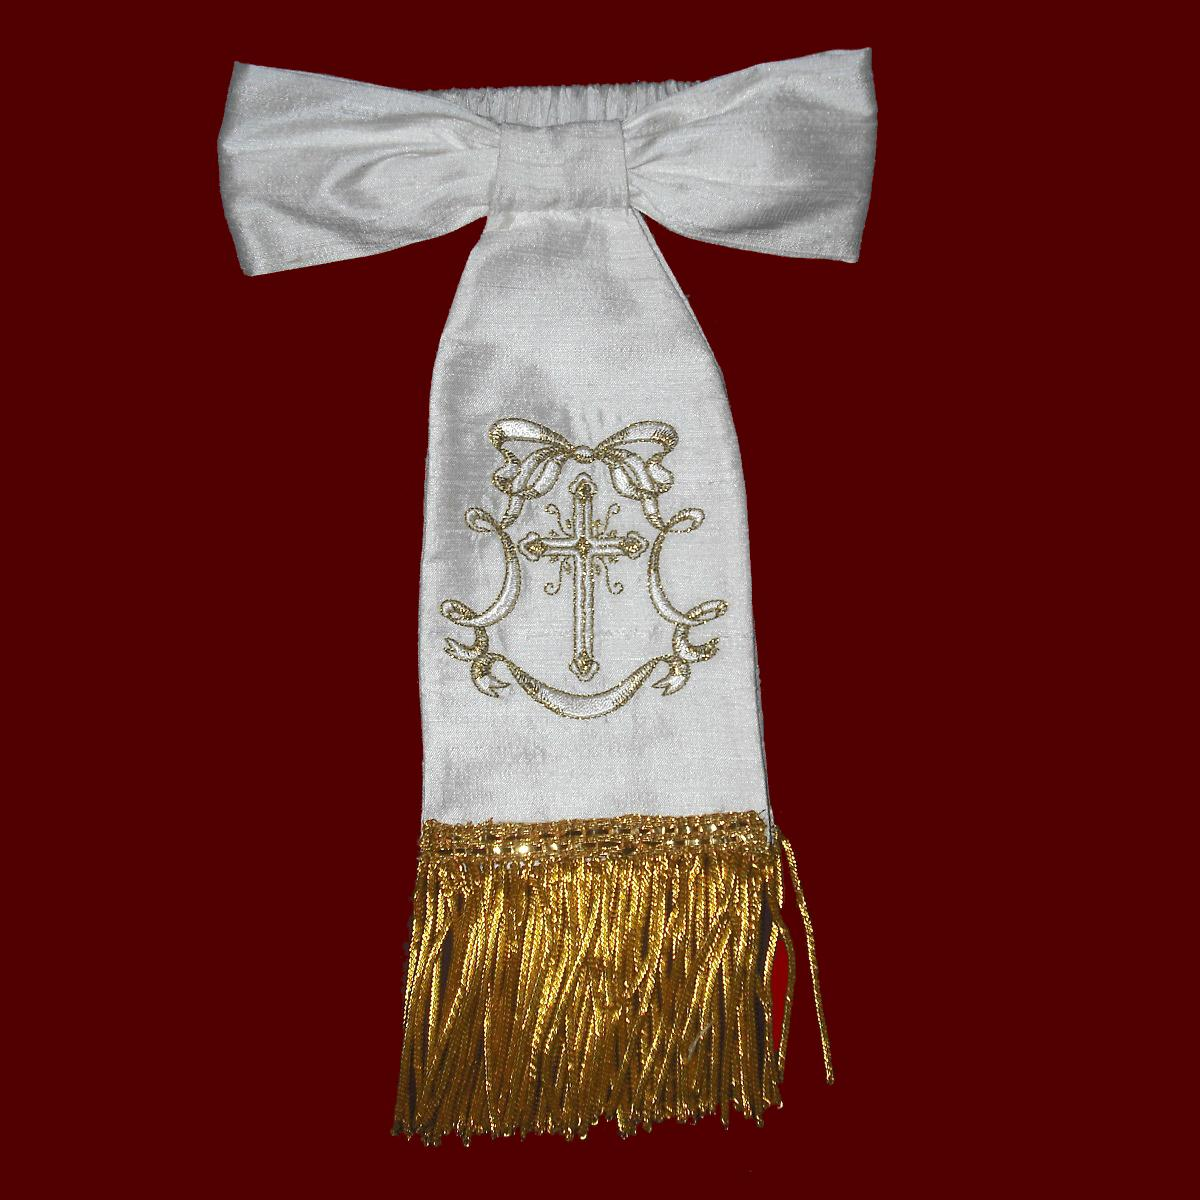 boys communion armband with metallic fringe - boy communion accessories